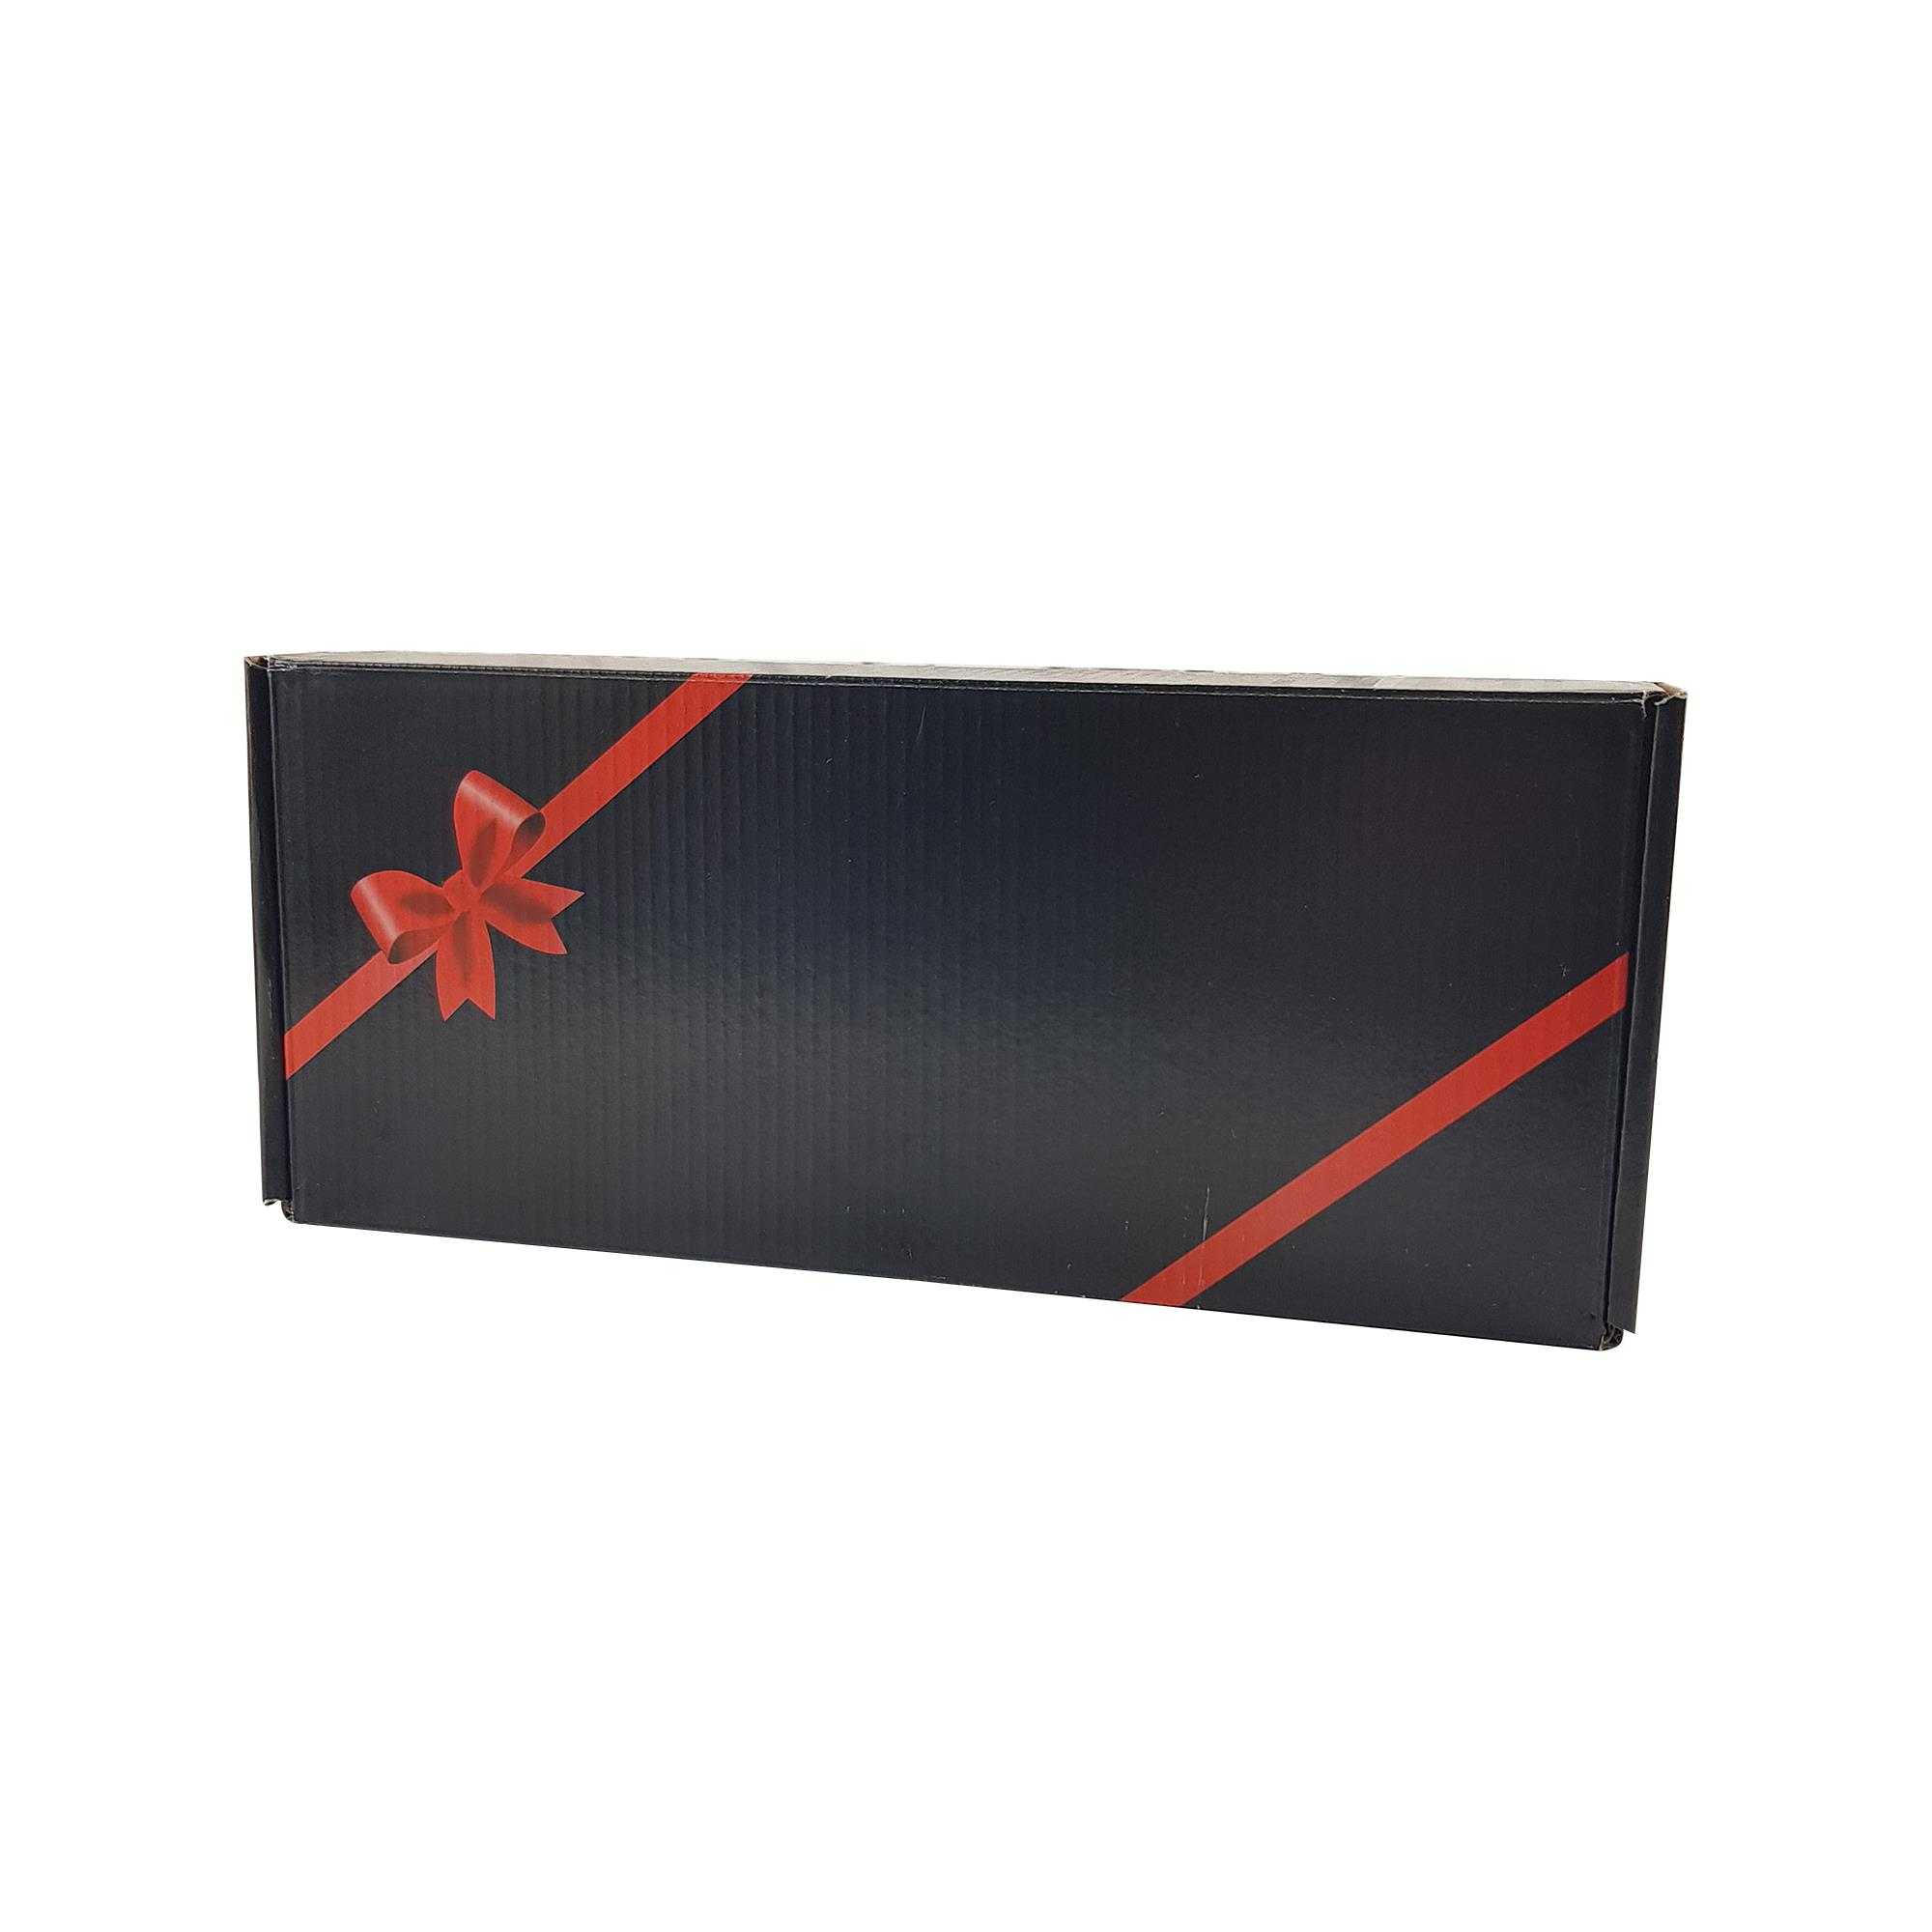 Özel Ahşap Kutulu İsme Özel Tükenmez Kalem ve Siyah Anahtarlık Set